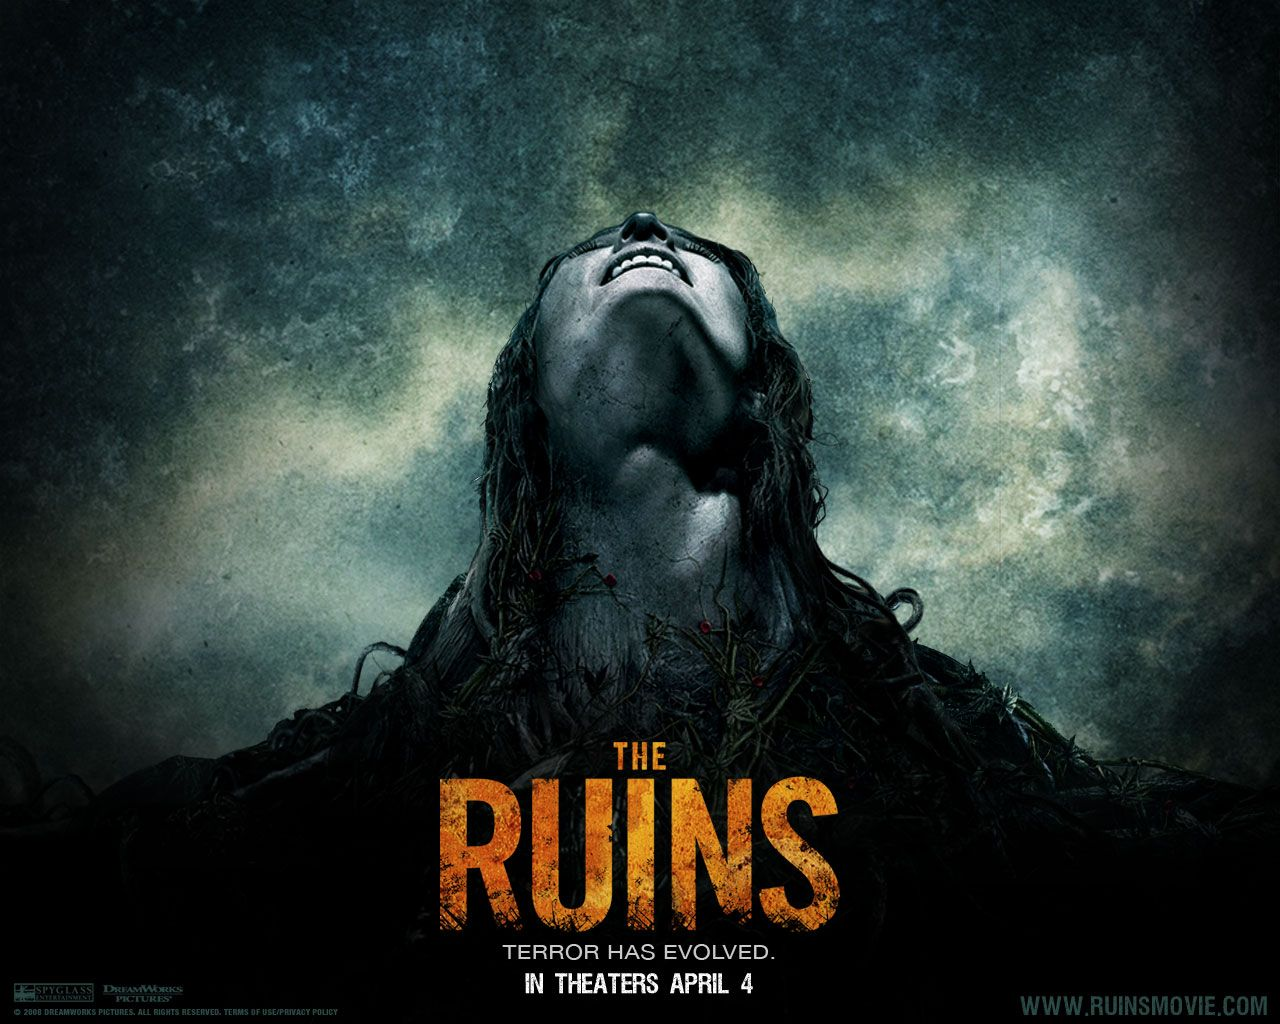 Watch Streaming HD The Ruins, starring Shawn Ashmore, Jena